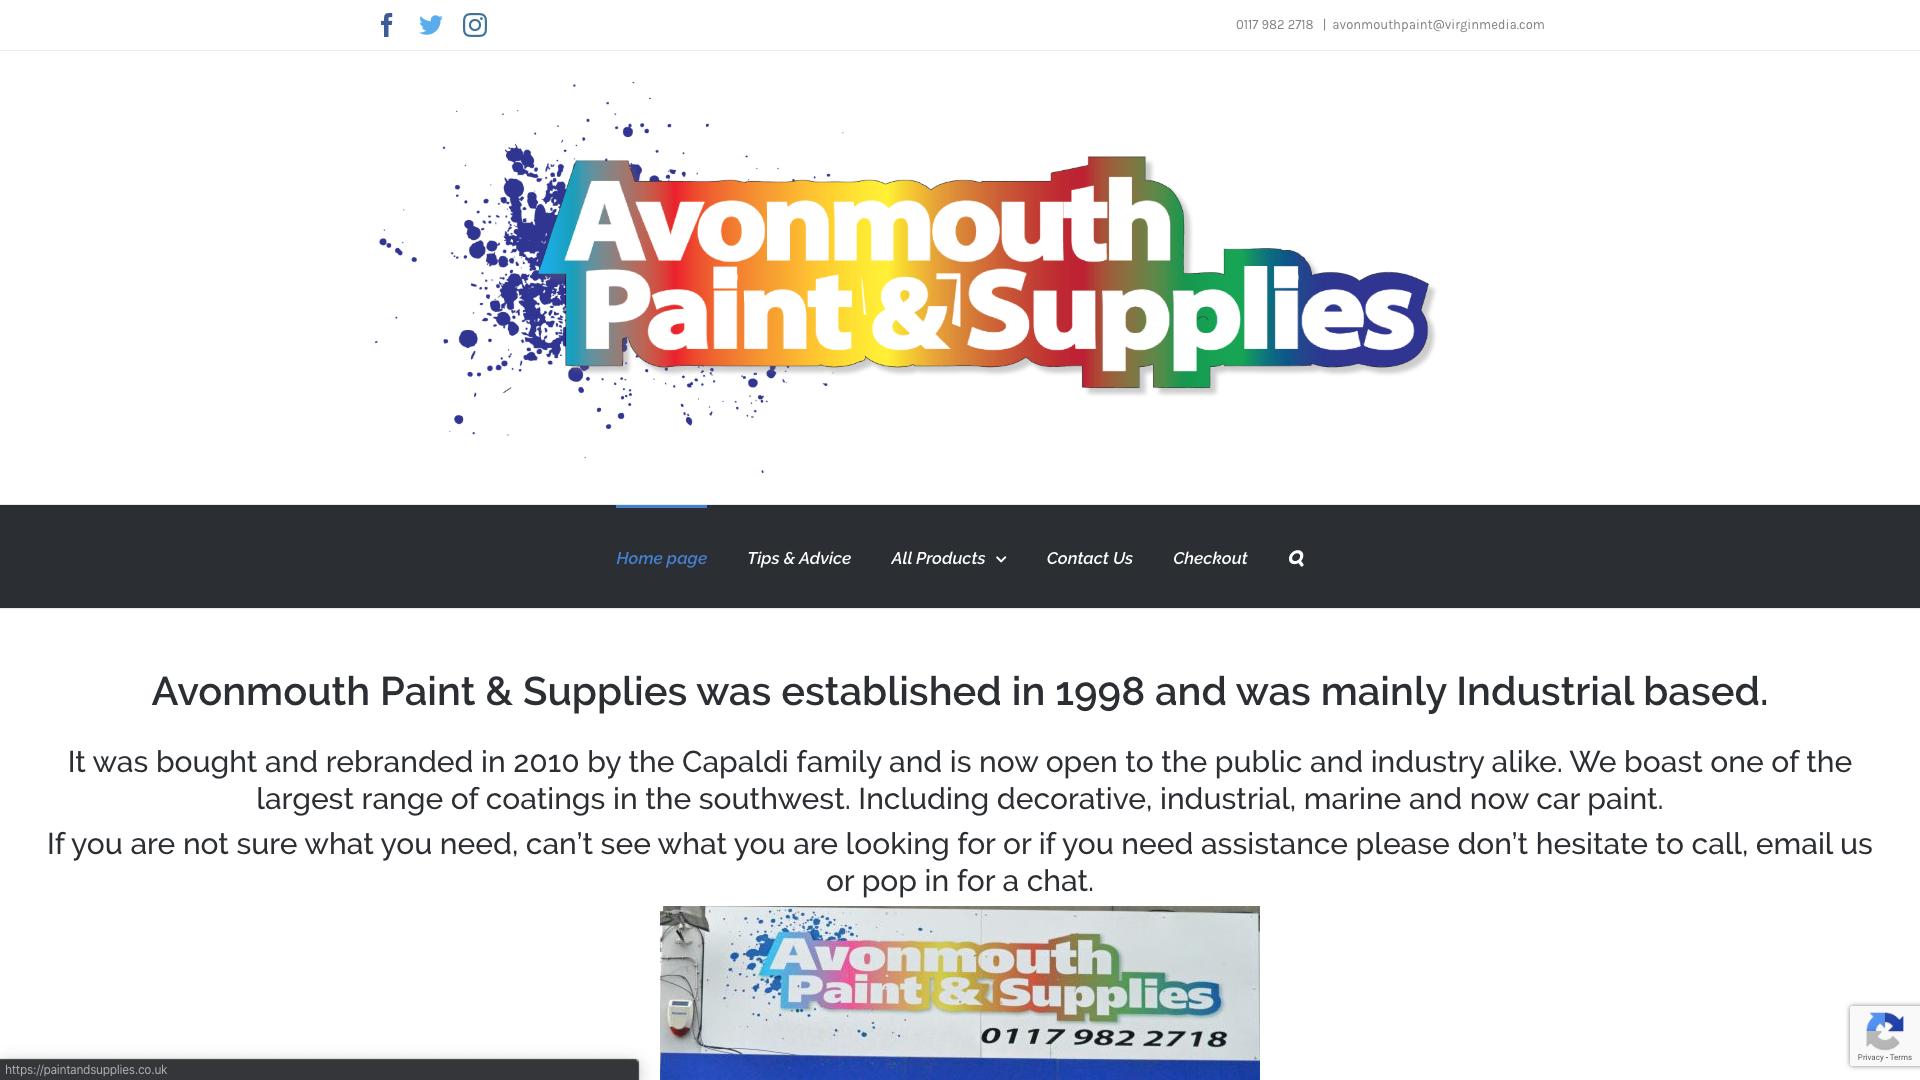 avonmouth paint